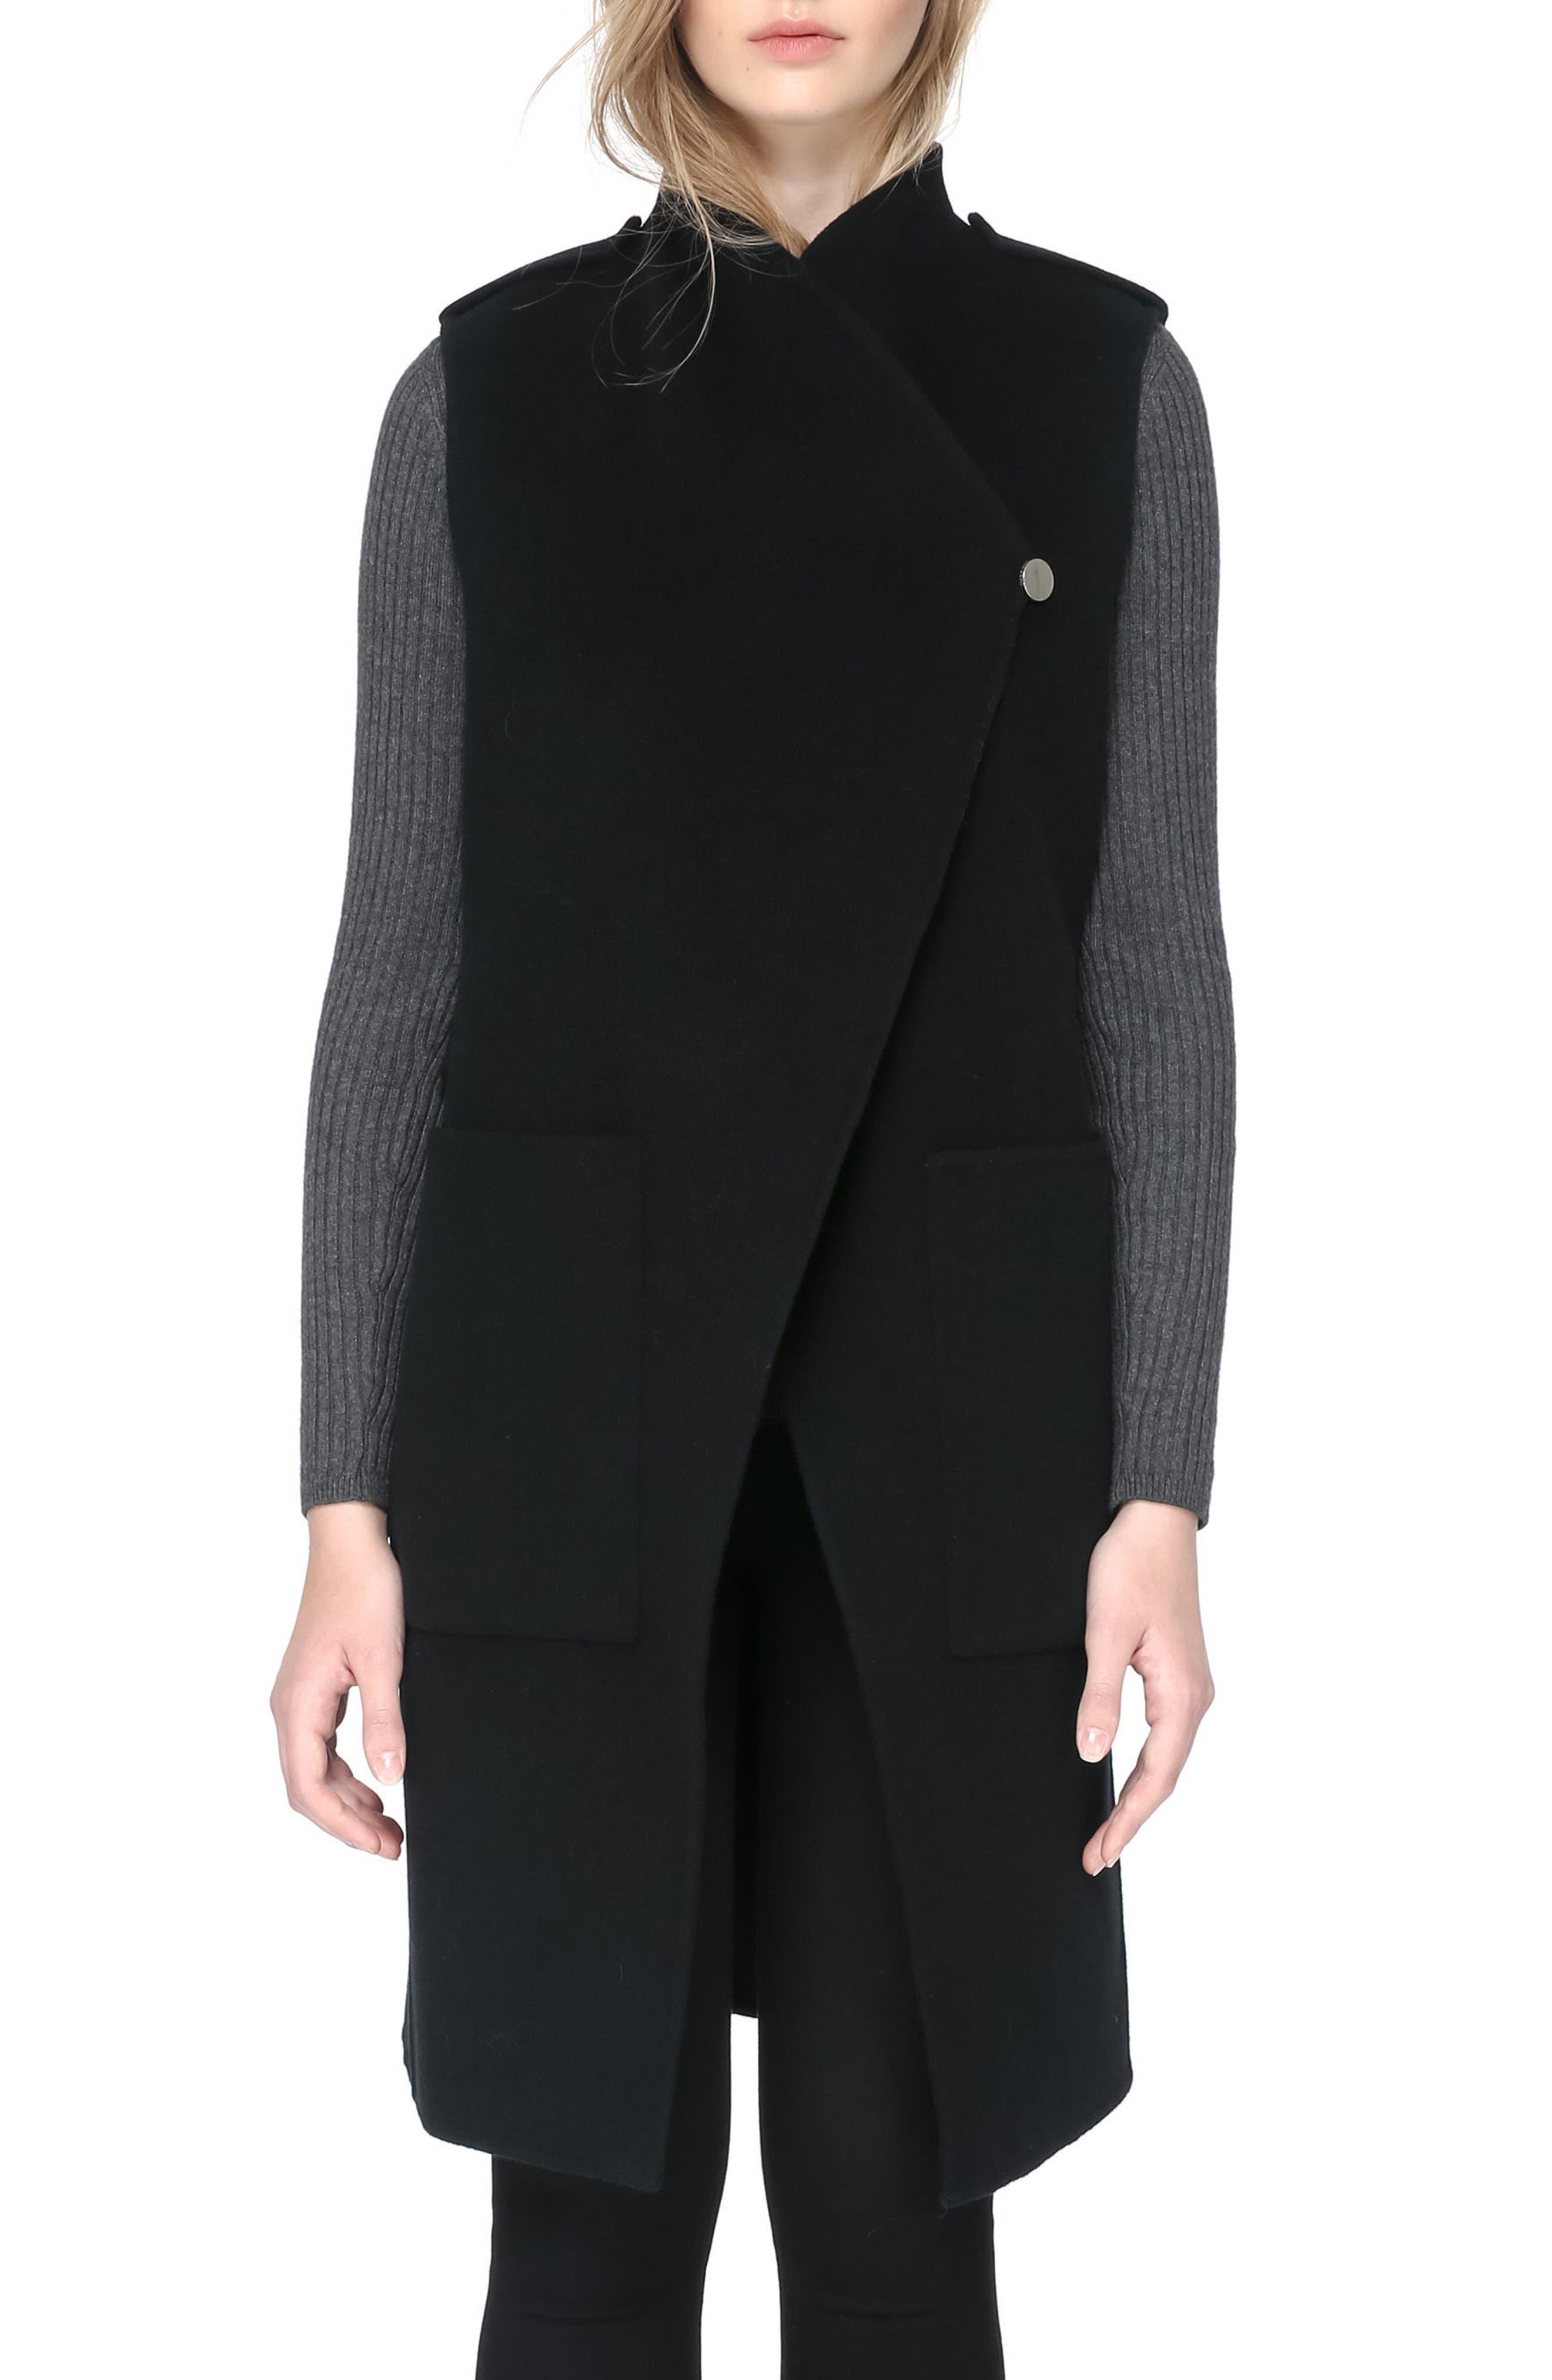 SOIA & KYO, Reversible Wool Blend Vest, Alternate thumbnail 4, color, 001